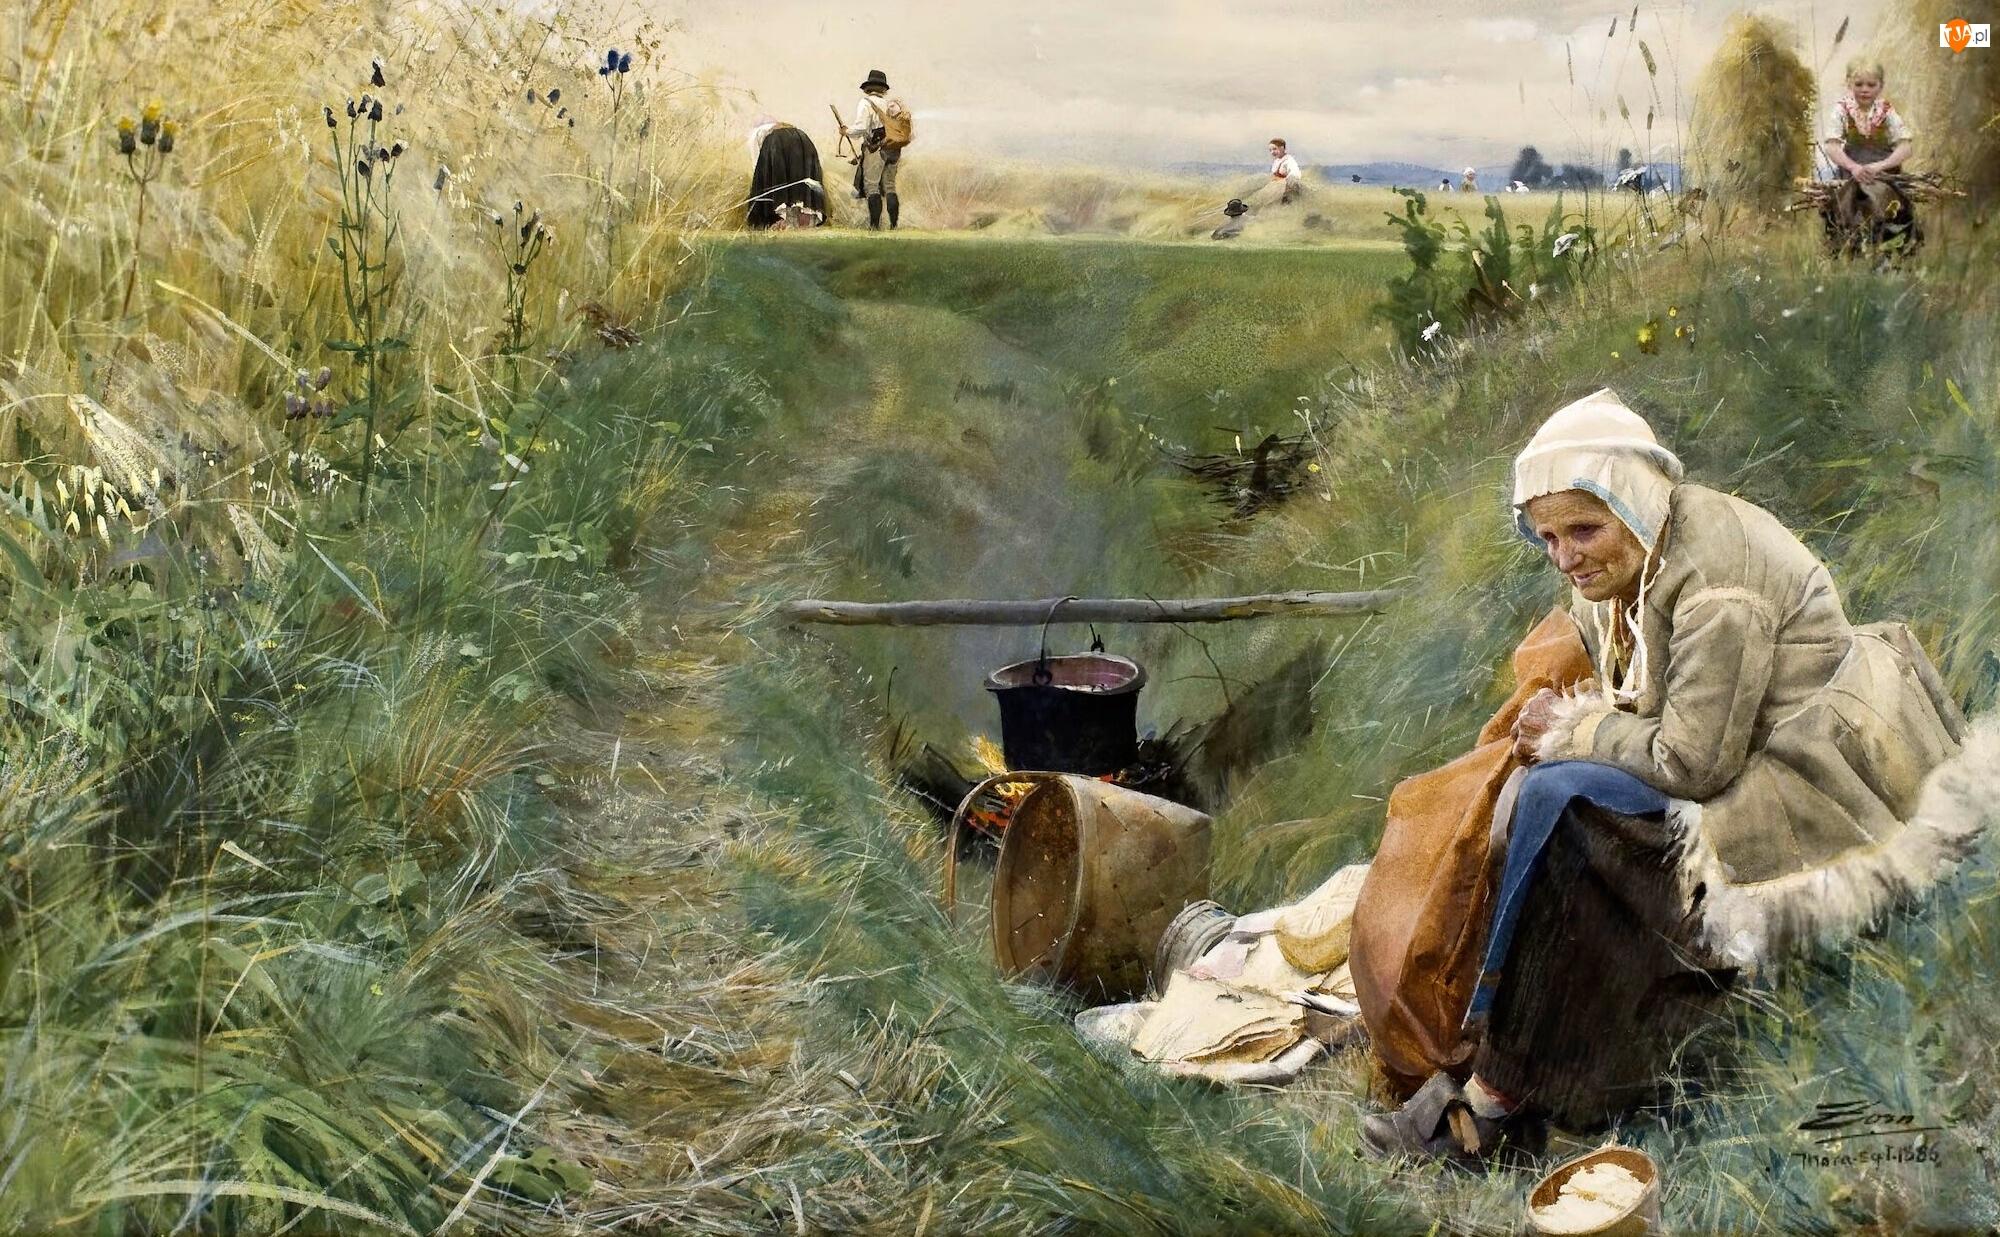 Obraz, Malarstwo, Kobieta, Pole, Anders Zorn, Ognisko